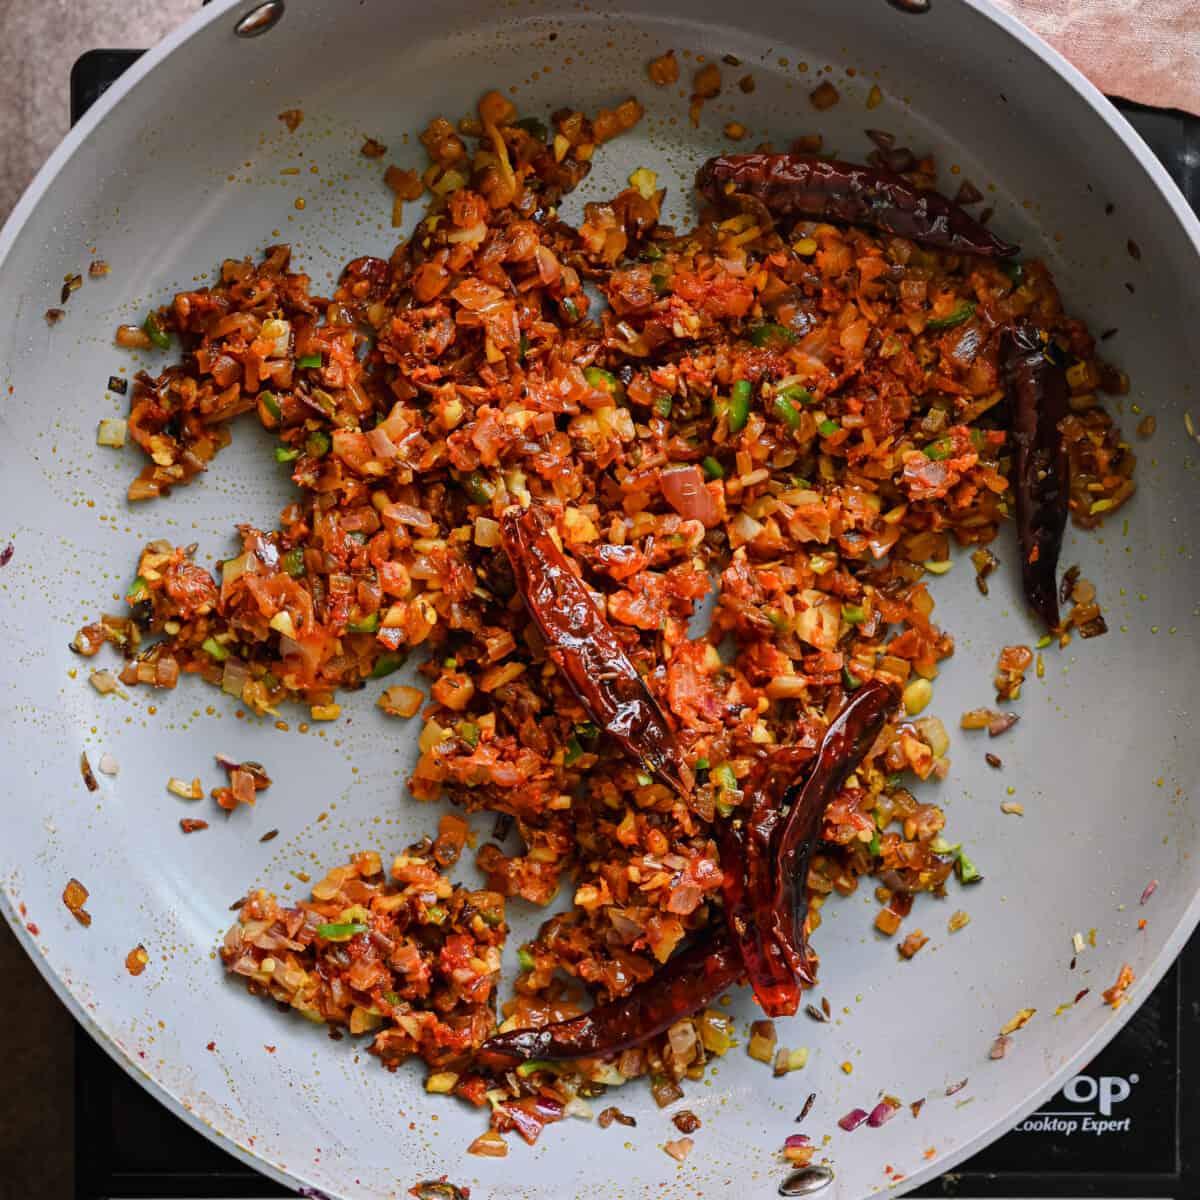 tomato paste stirred into aromatics for indian masala